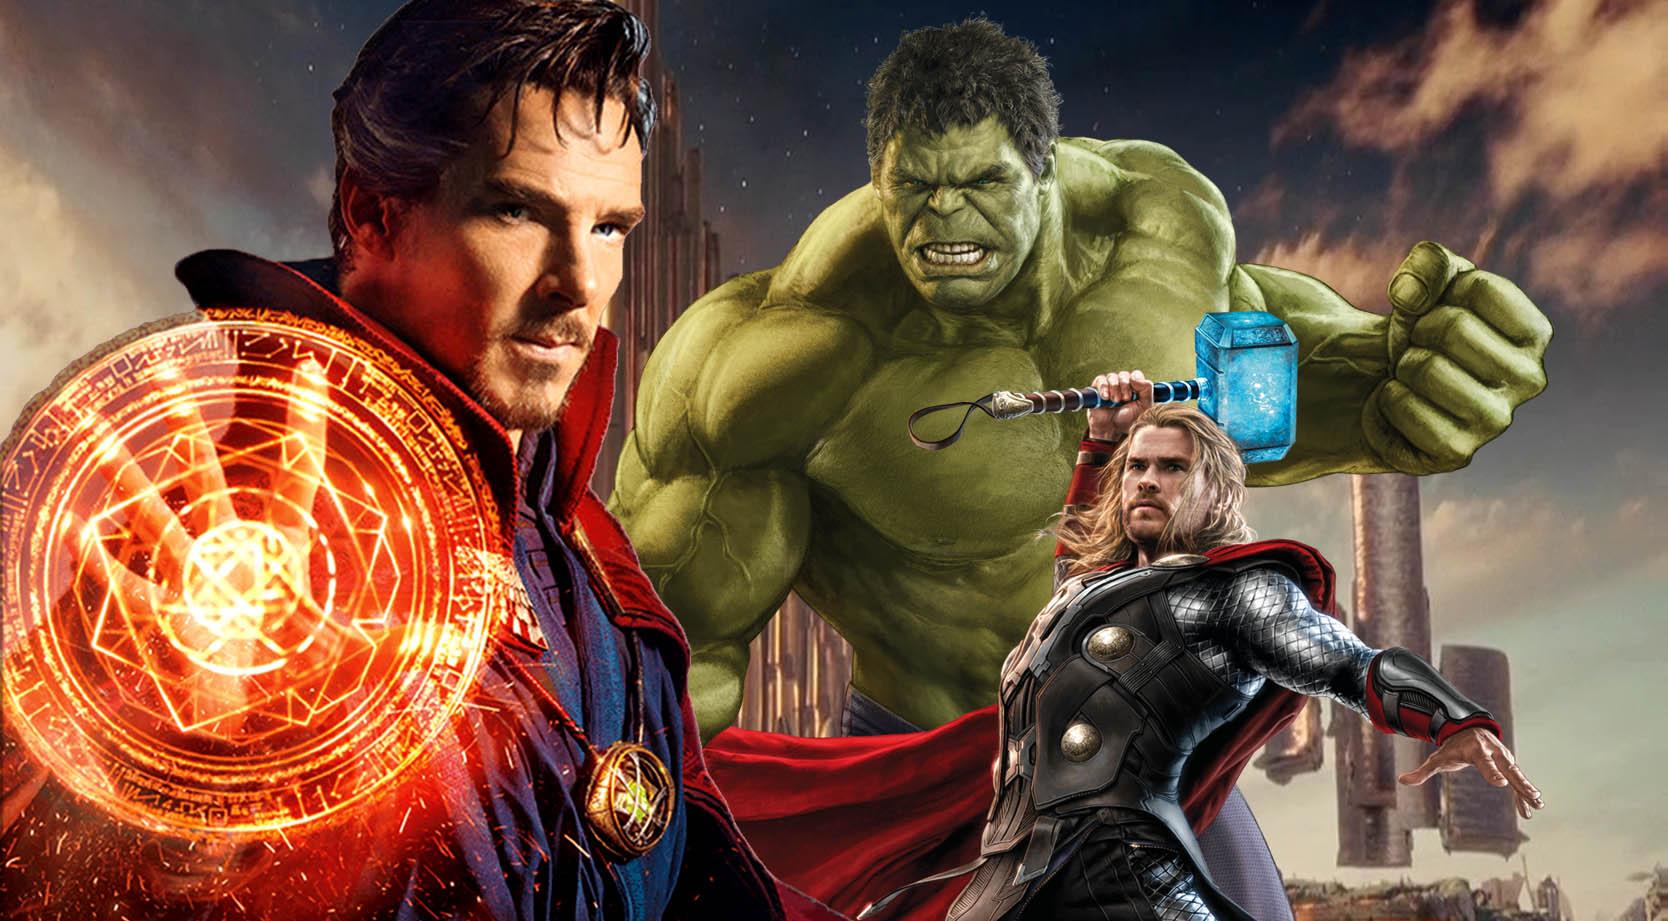 Doctor Strange Confirmed for Thor: Ragnarok